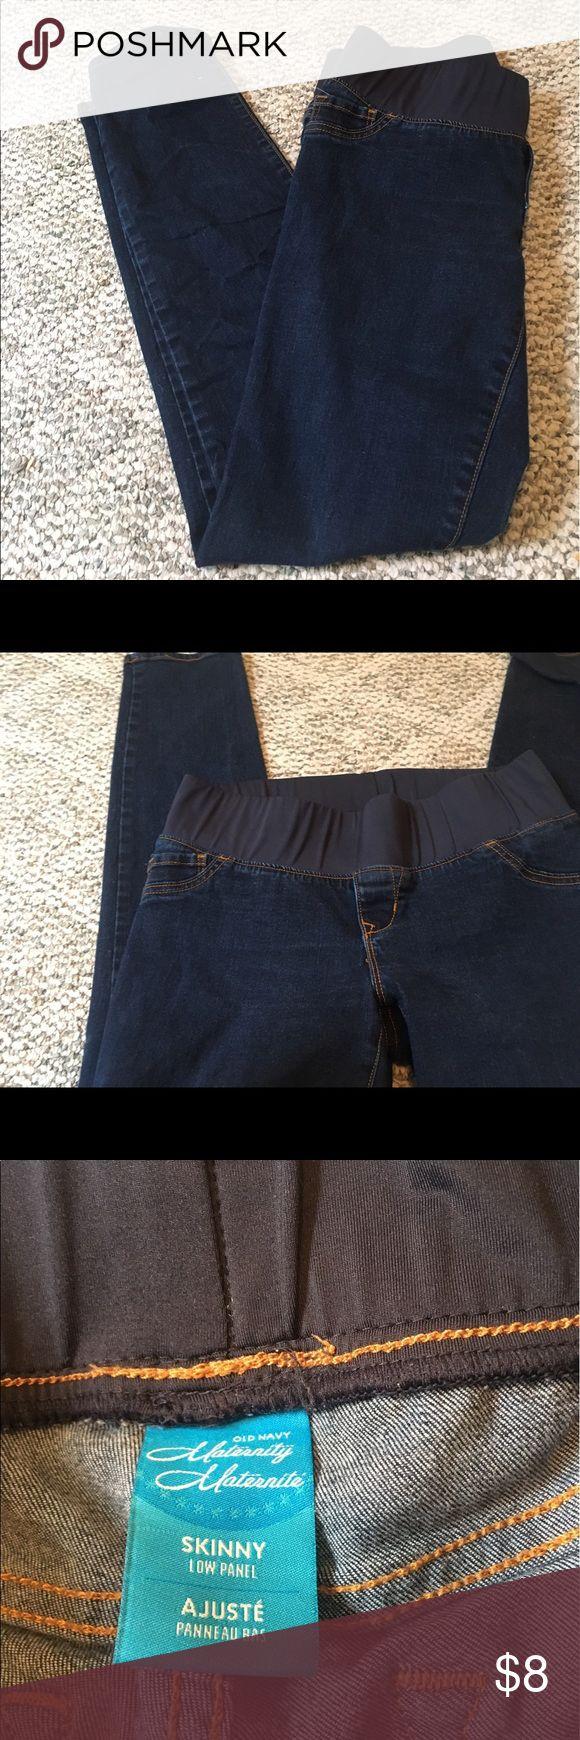 Maternity Jeans Old navy maternity jeans, size 8. Old Navy Jeans Skinny